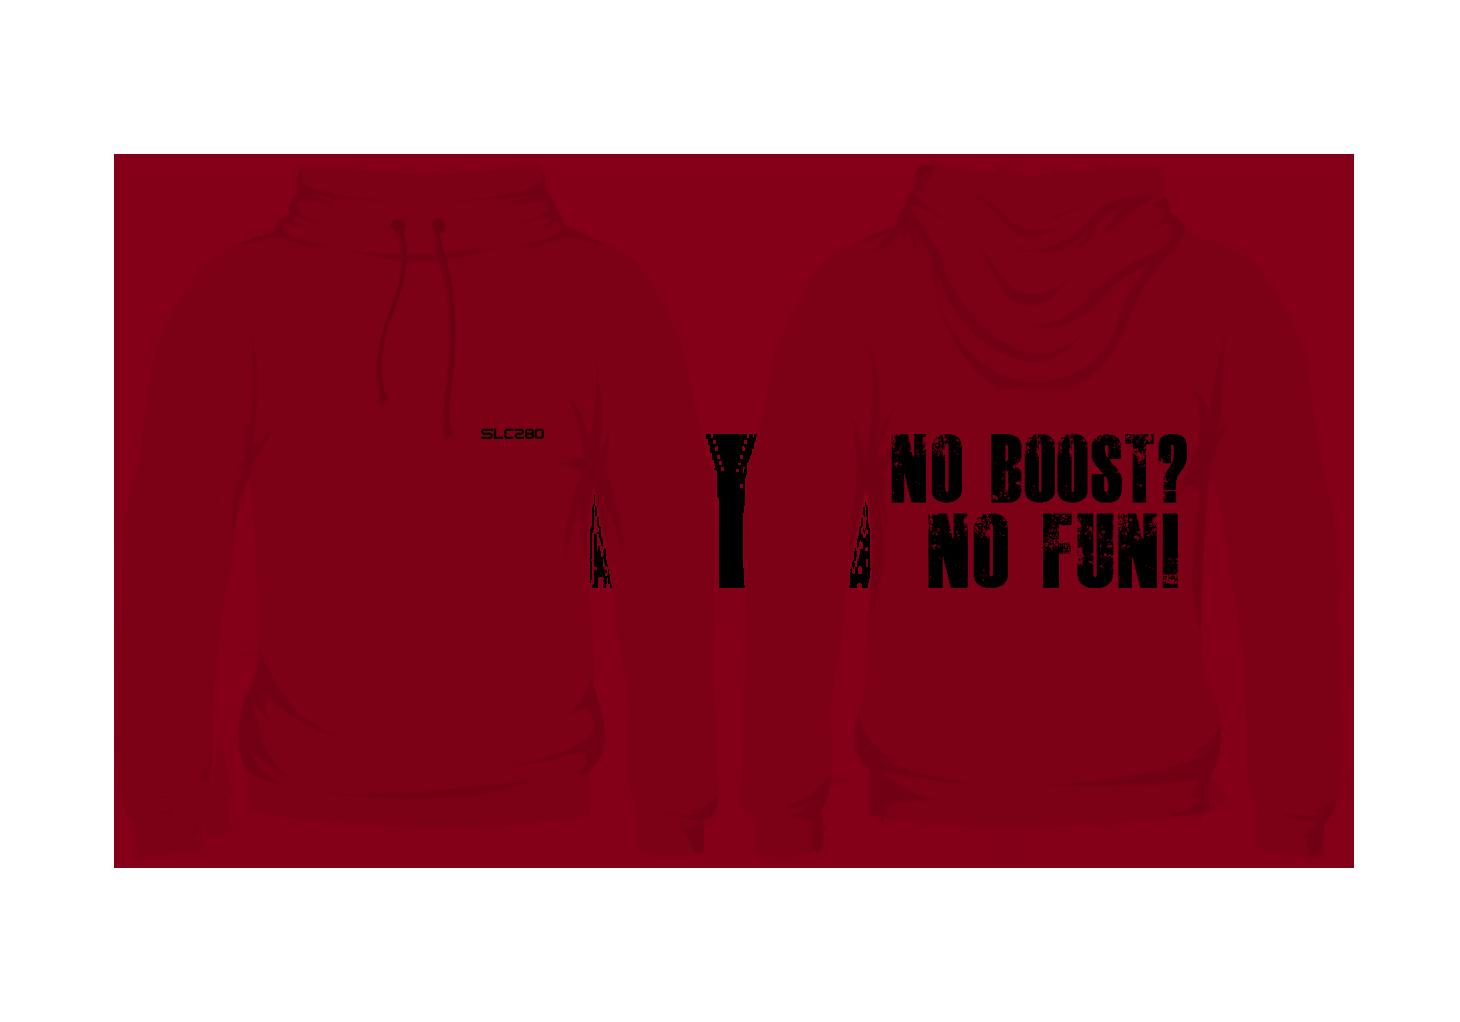 NoBoostNoFunrot